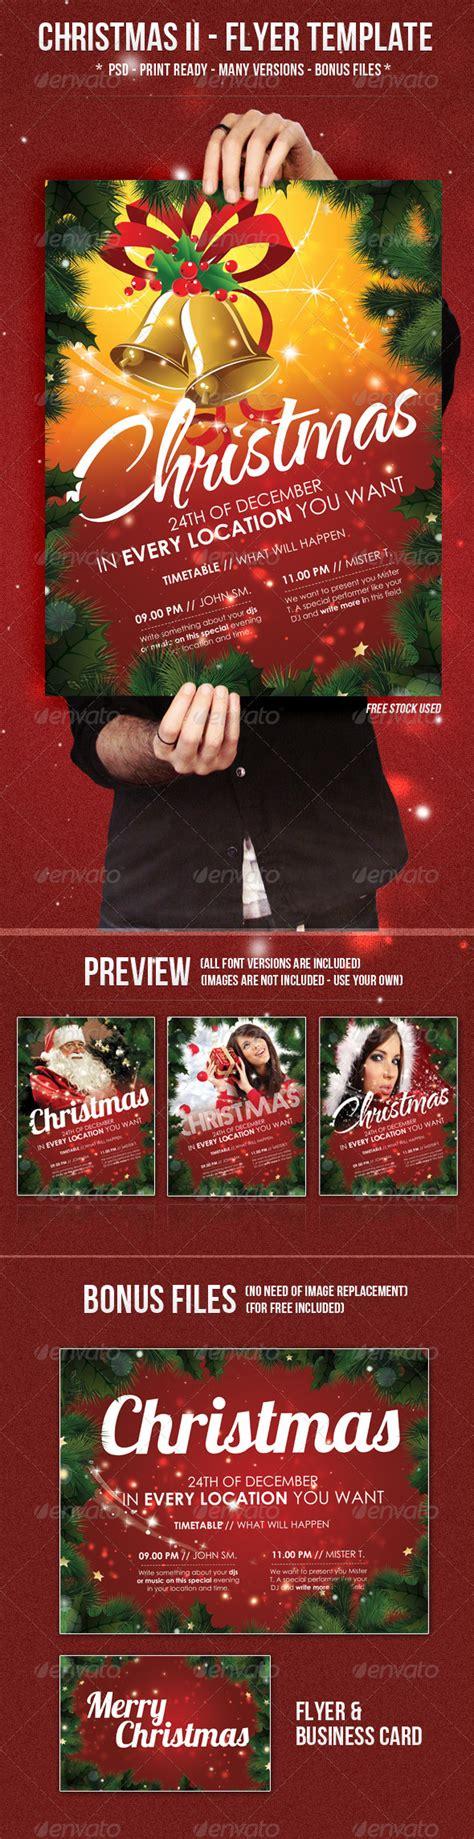 Christmas Ii Flyer Template Graphicriver Ii Flyer Template